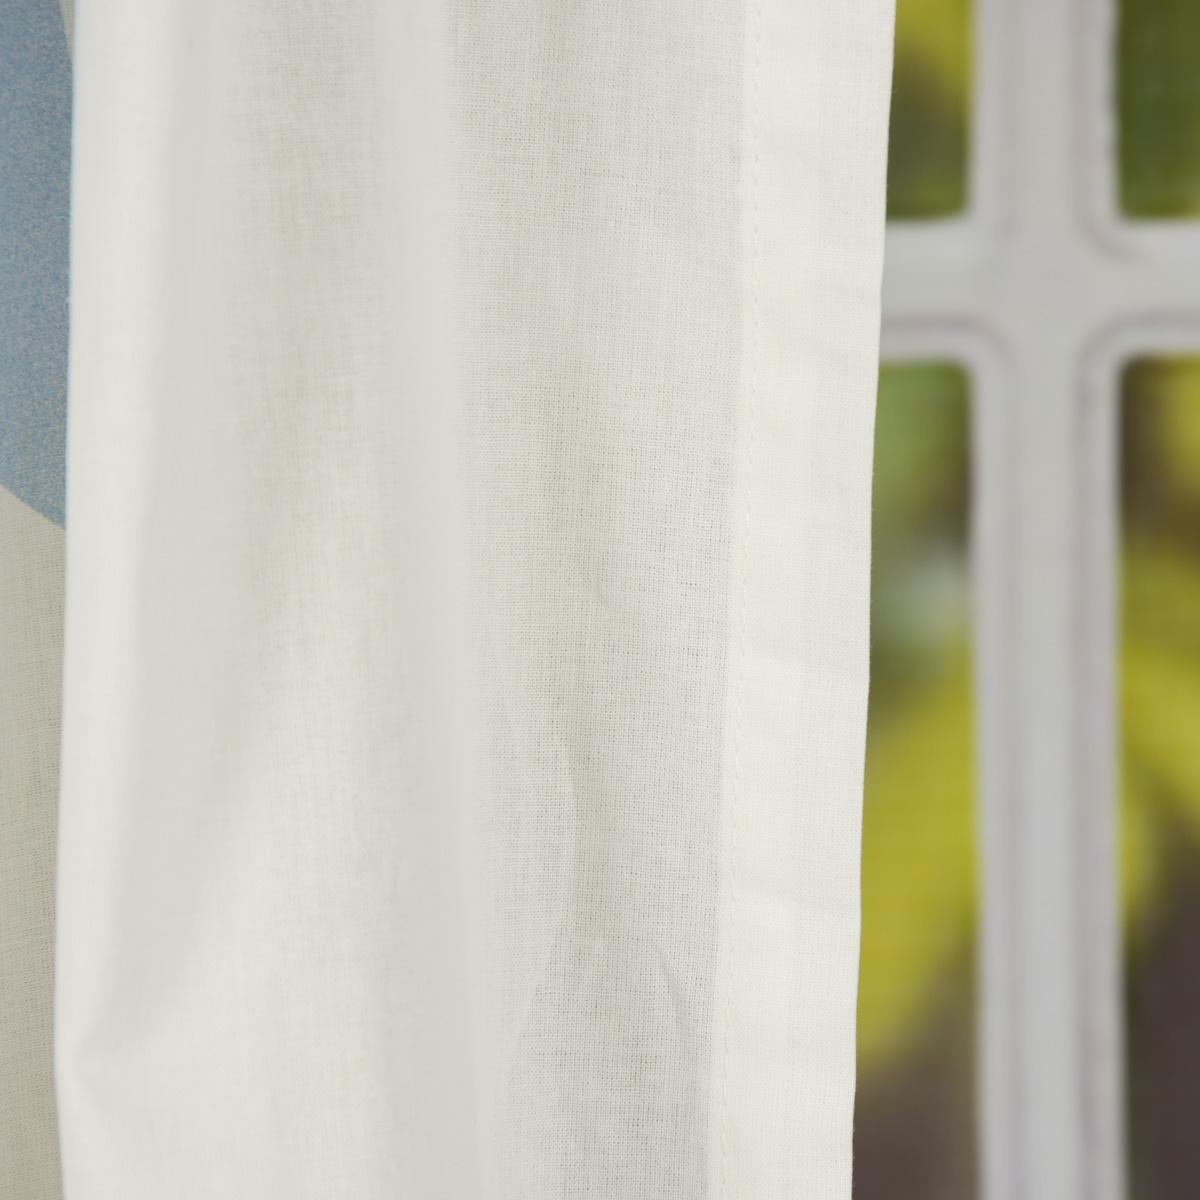 fertiggardine fertigschal flags mit verdeckten schlaufen. Black Bedroom Furniture Sets. Home Design Ideas